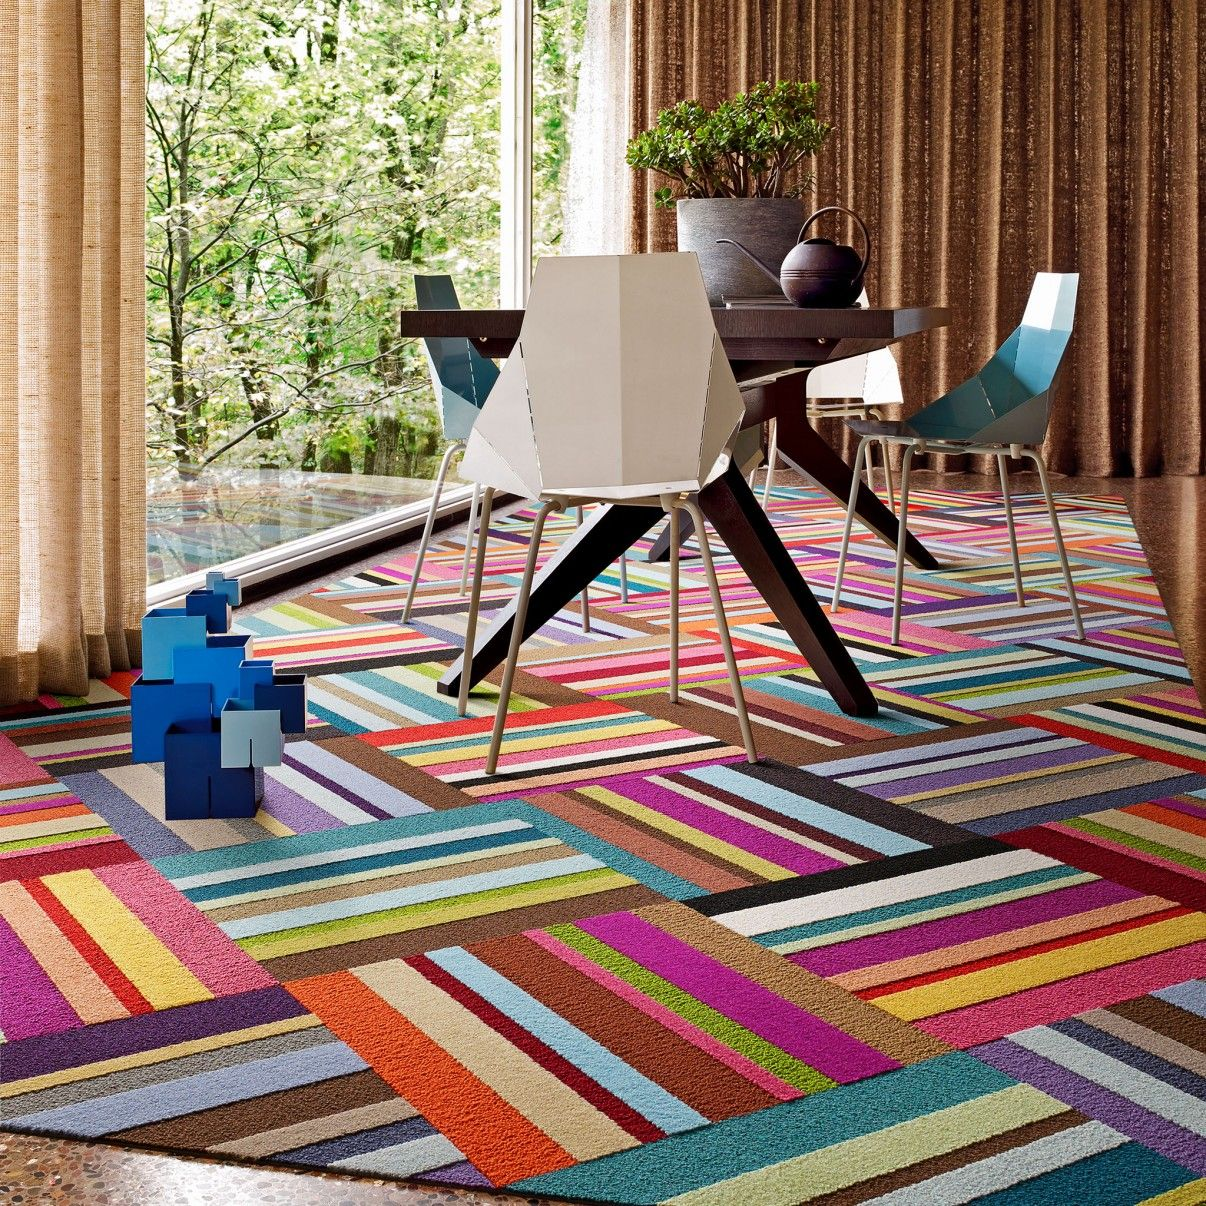 Flor S Parallel Reality Carpet Tiles Set On The Diagonal Carpet Tiles Patchwork Rugs Carpet Tiles Office